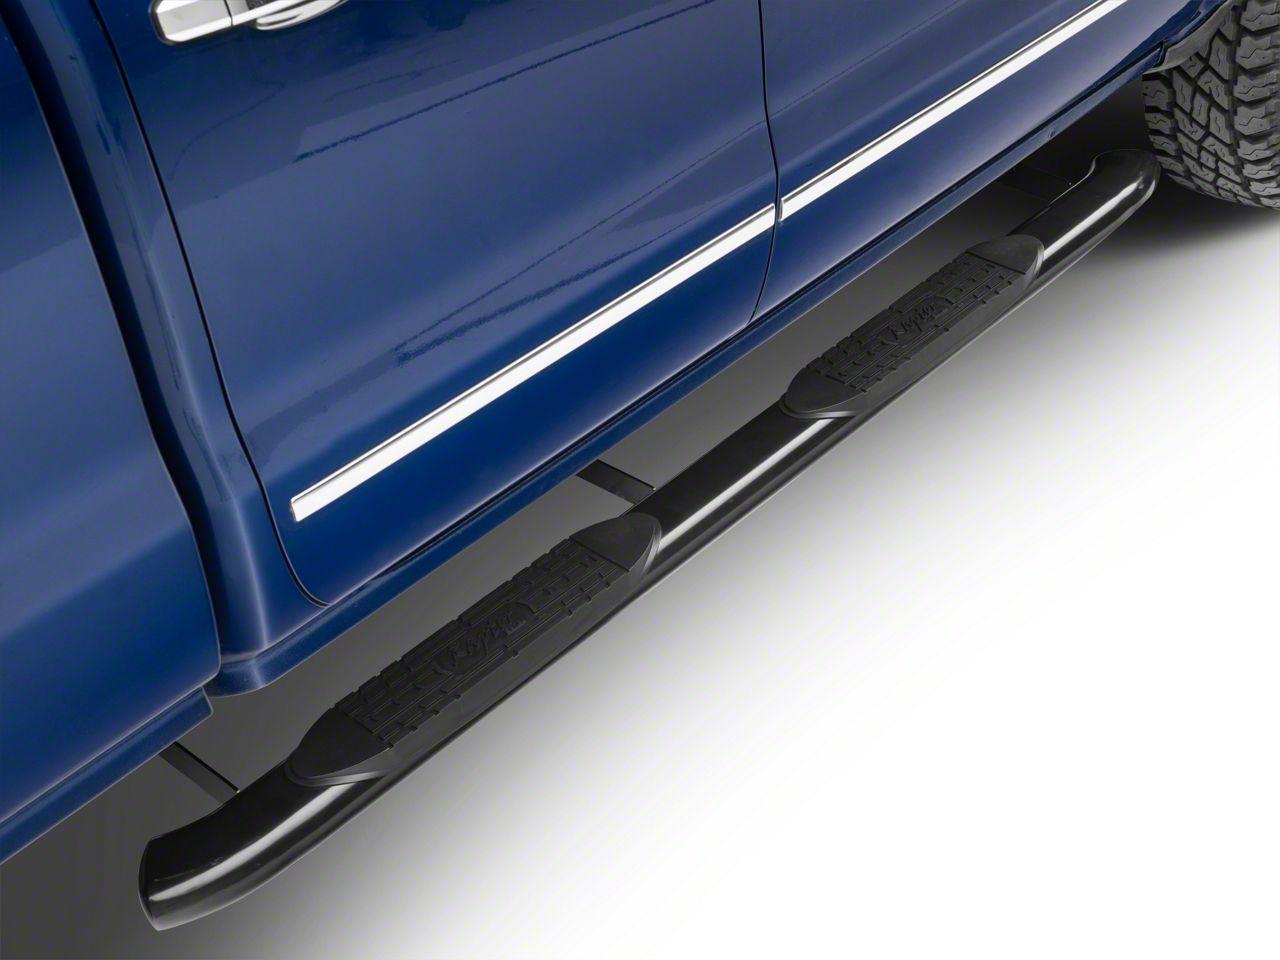 Raptor Series 5 in. OE Style Curved Oval Body Mount Side Step Bars - Black (14-18 Silverado 1500)